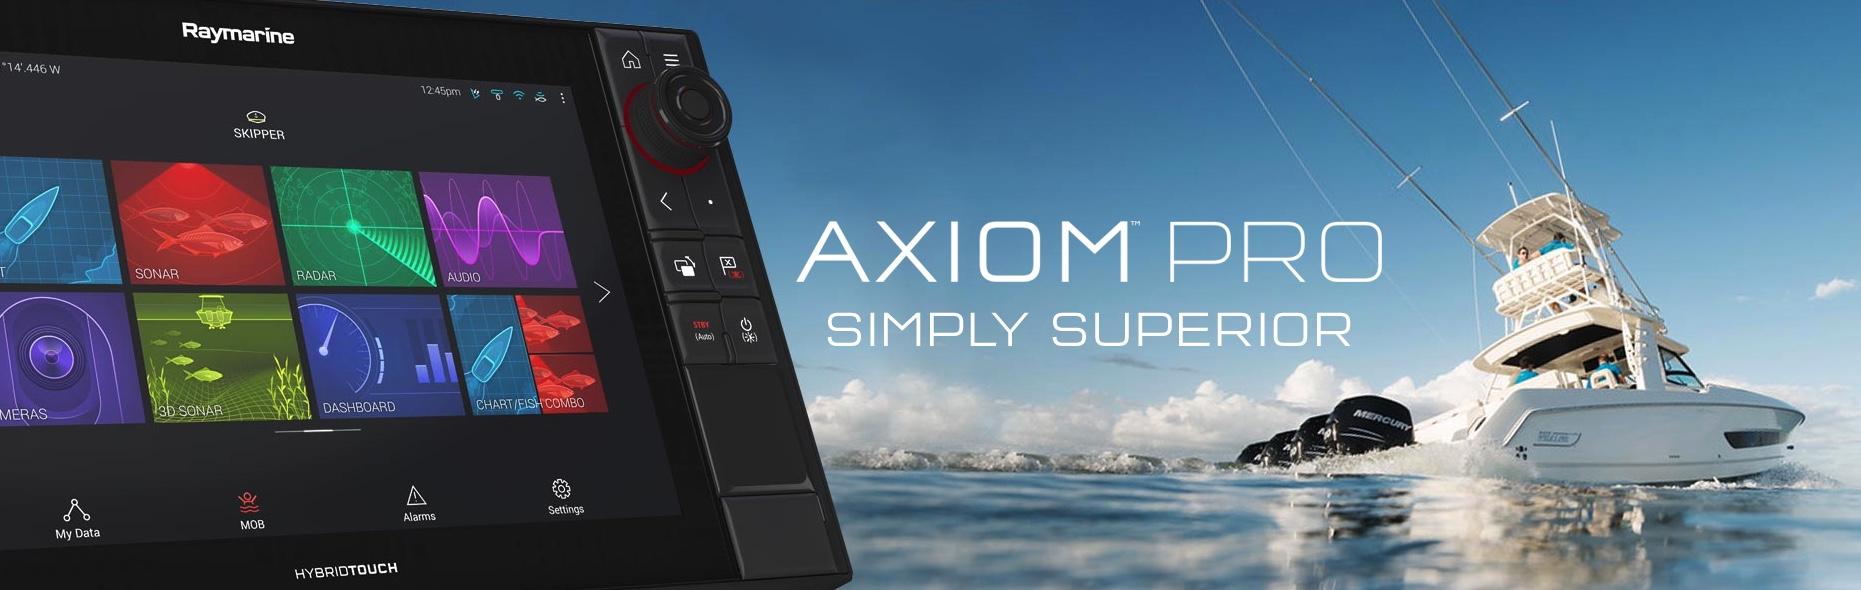 axiom-pro-banner.jpg